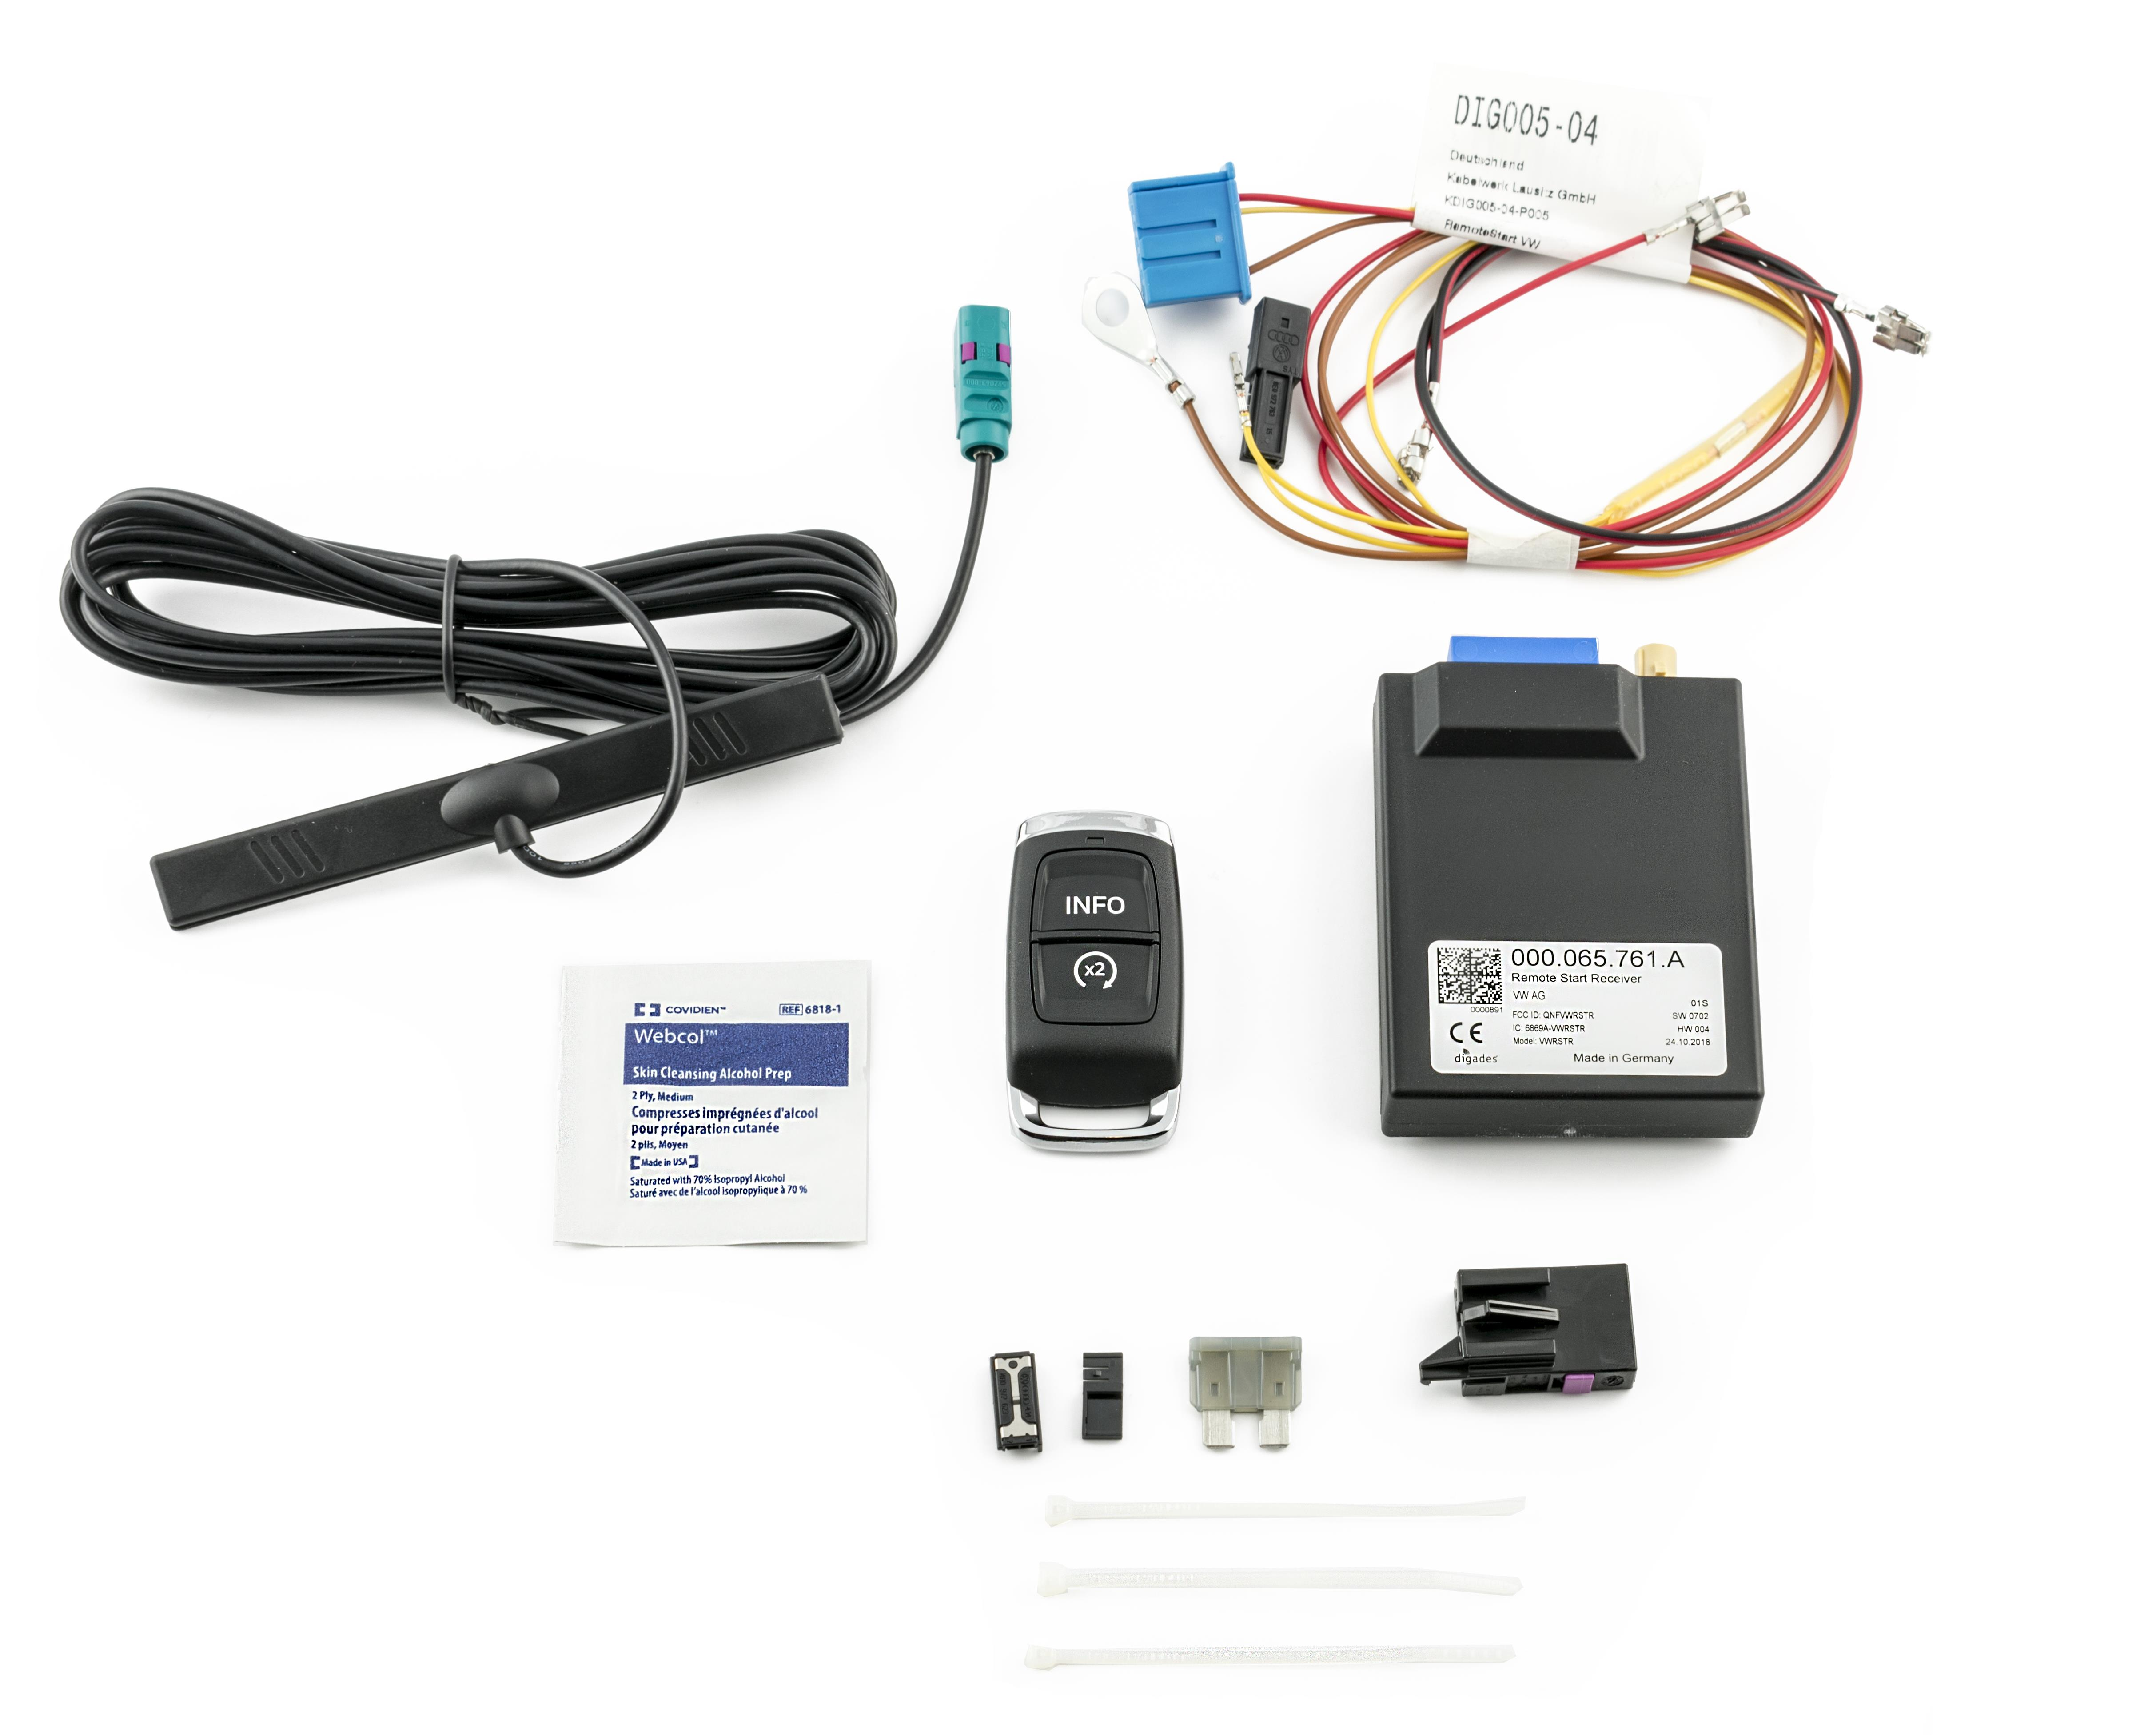 Volkswagen Atlas Remote Start Kit